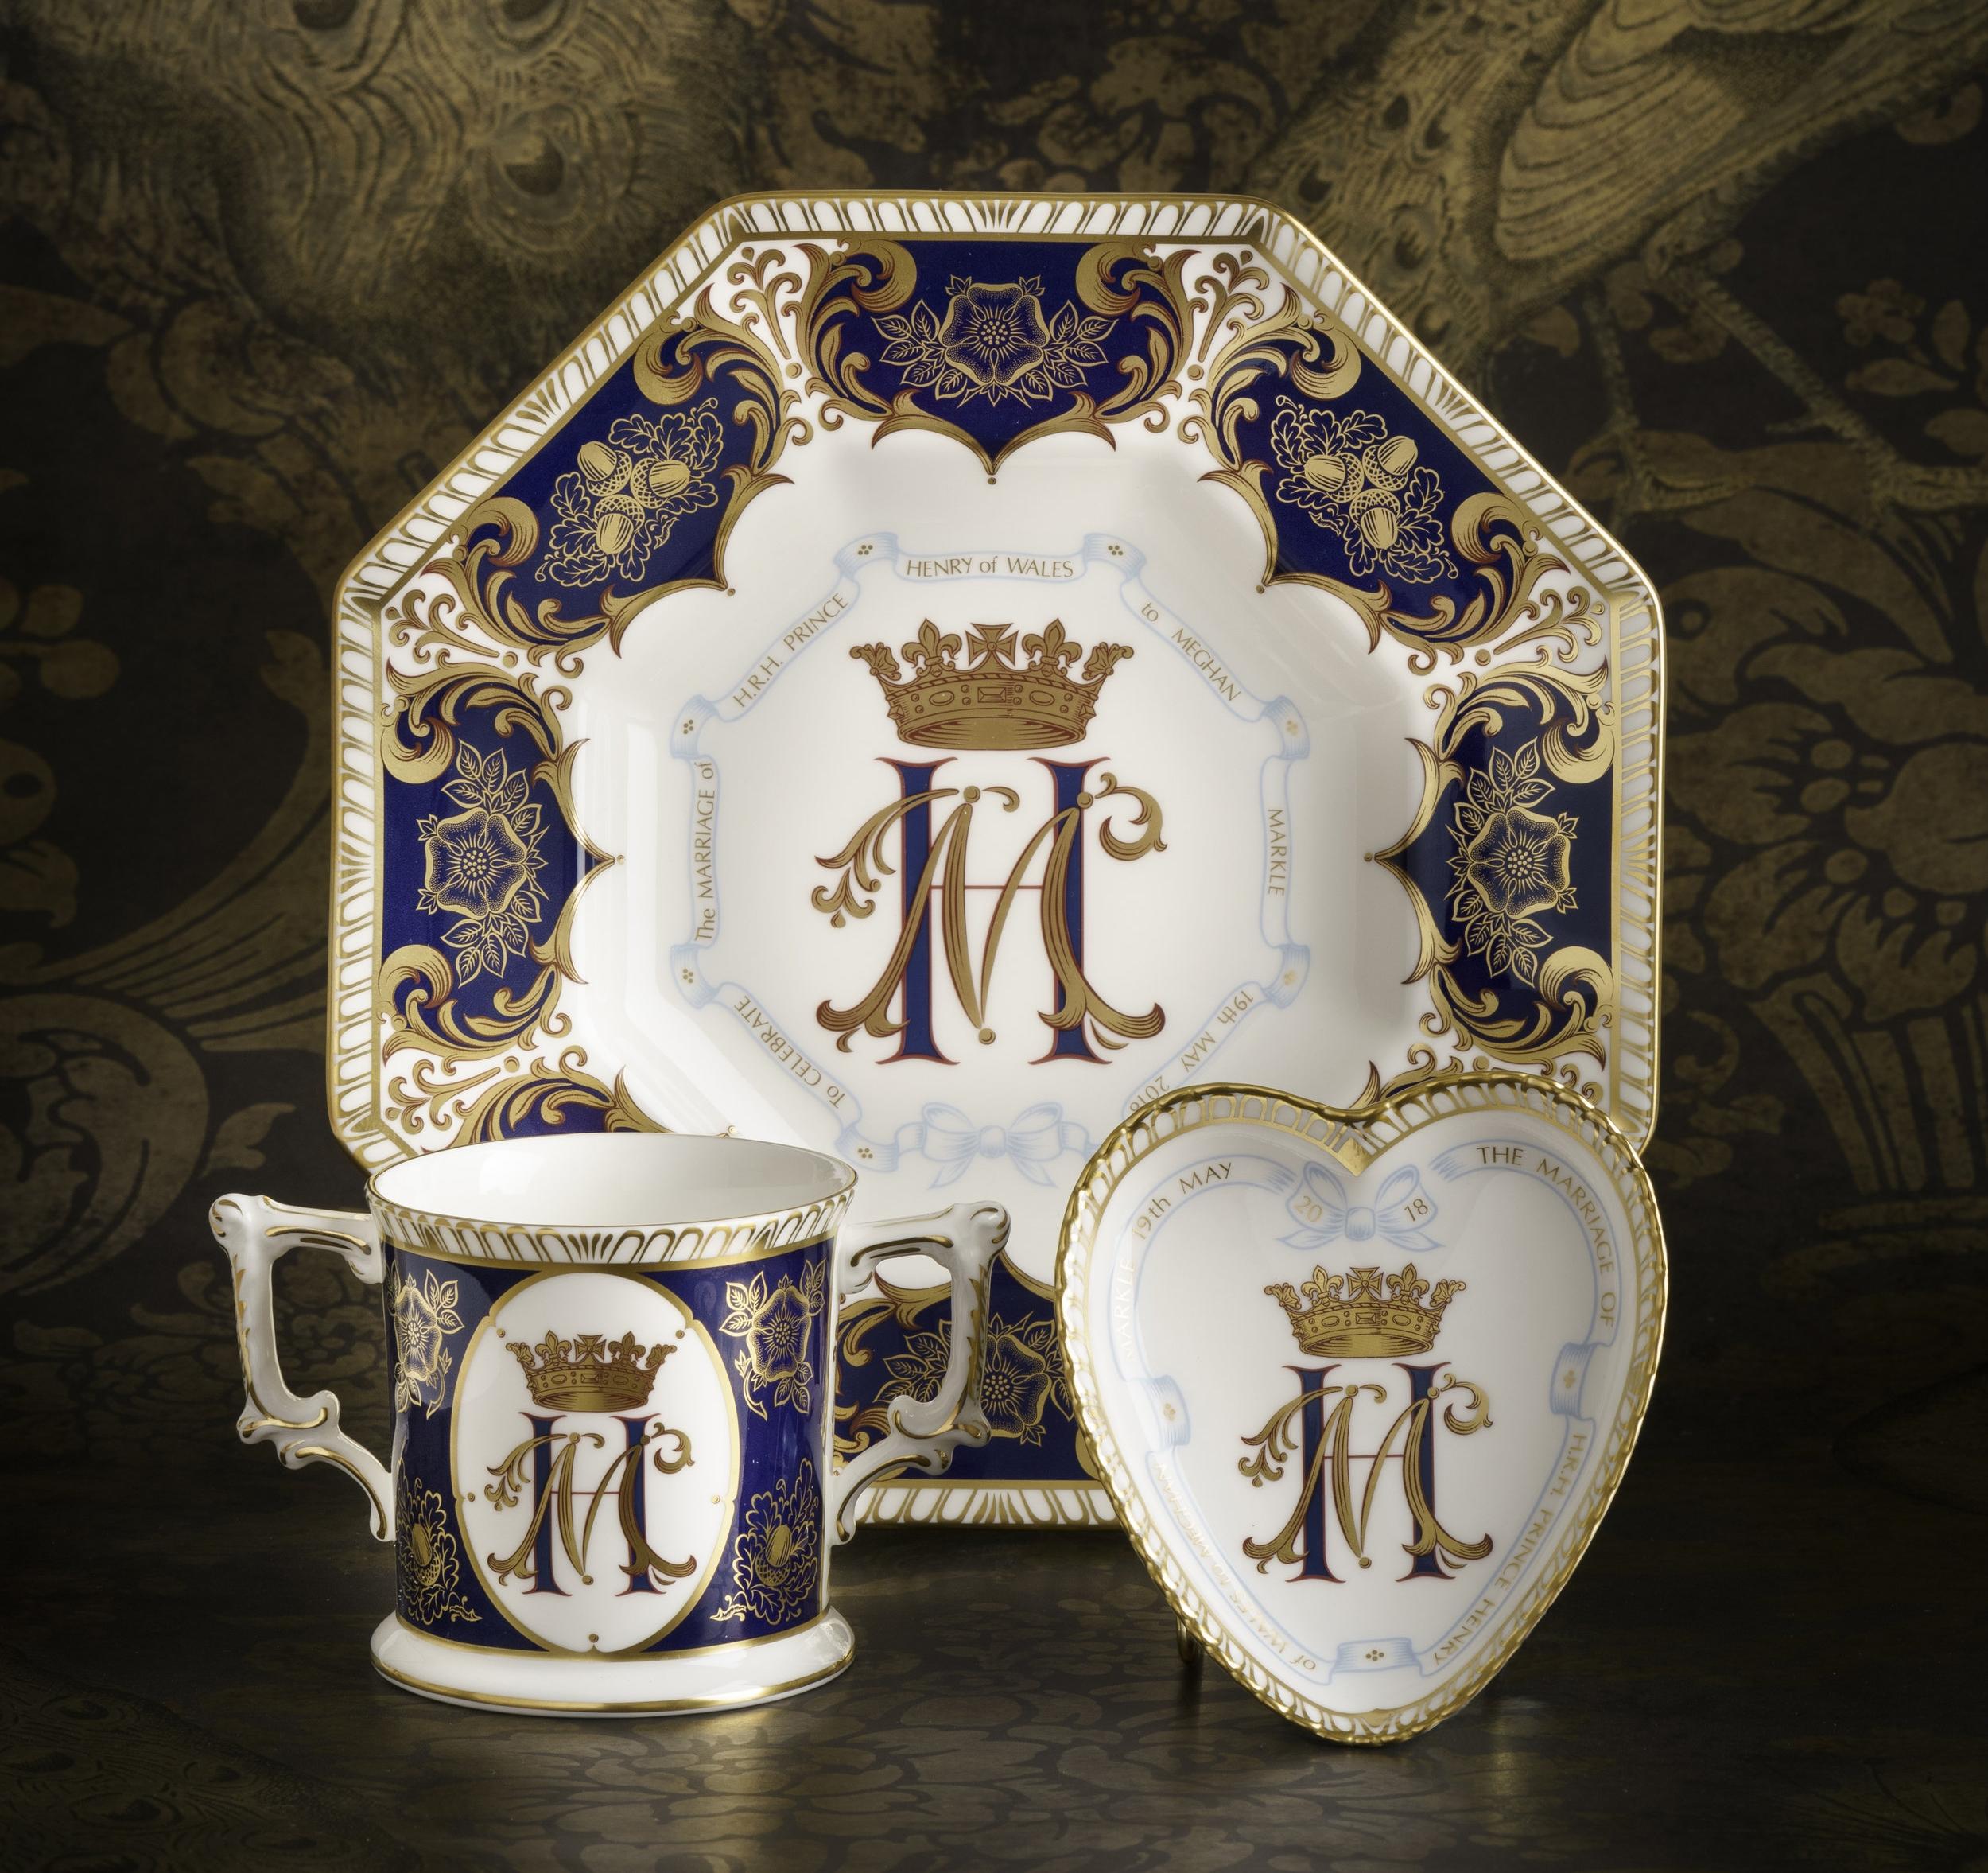 2018 Royal Wedding Collection